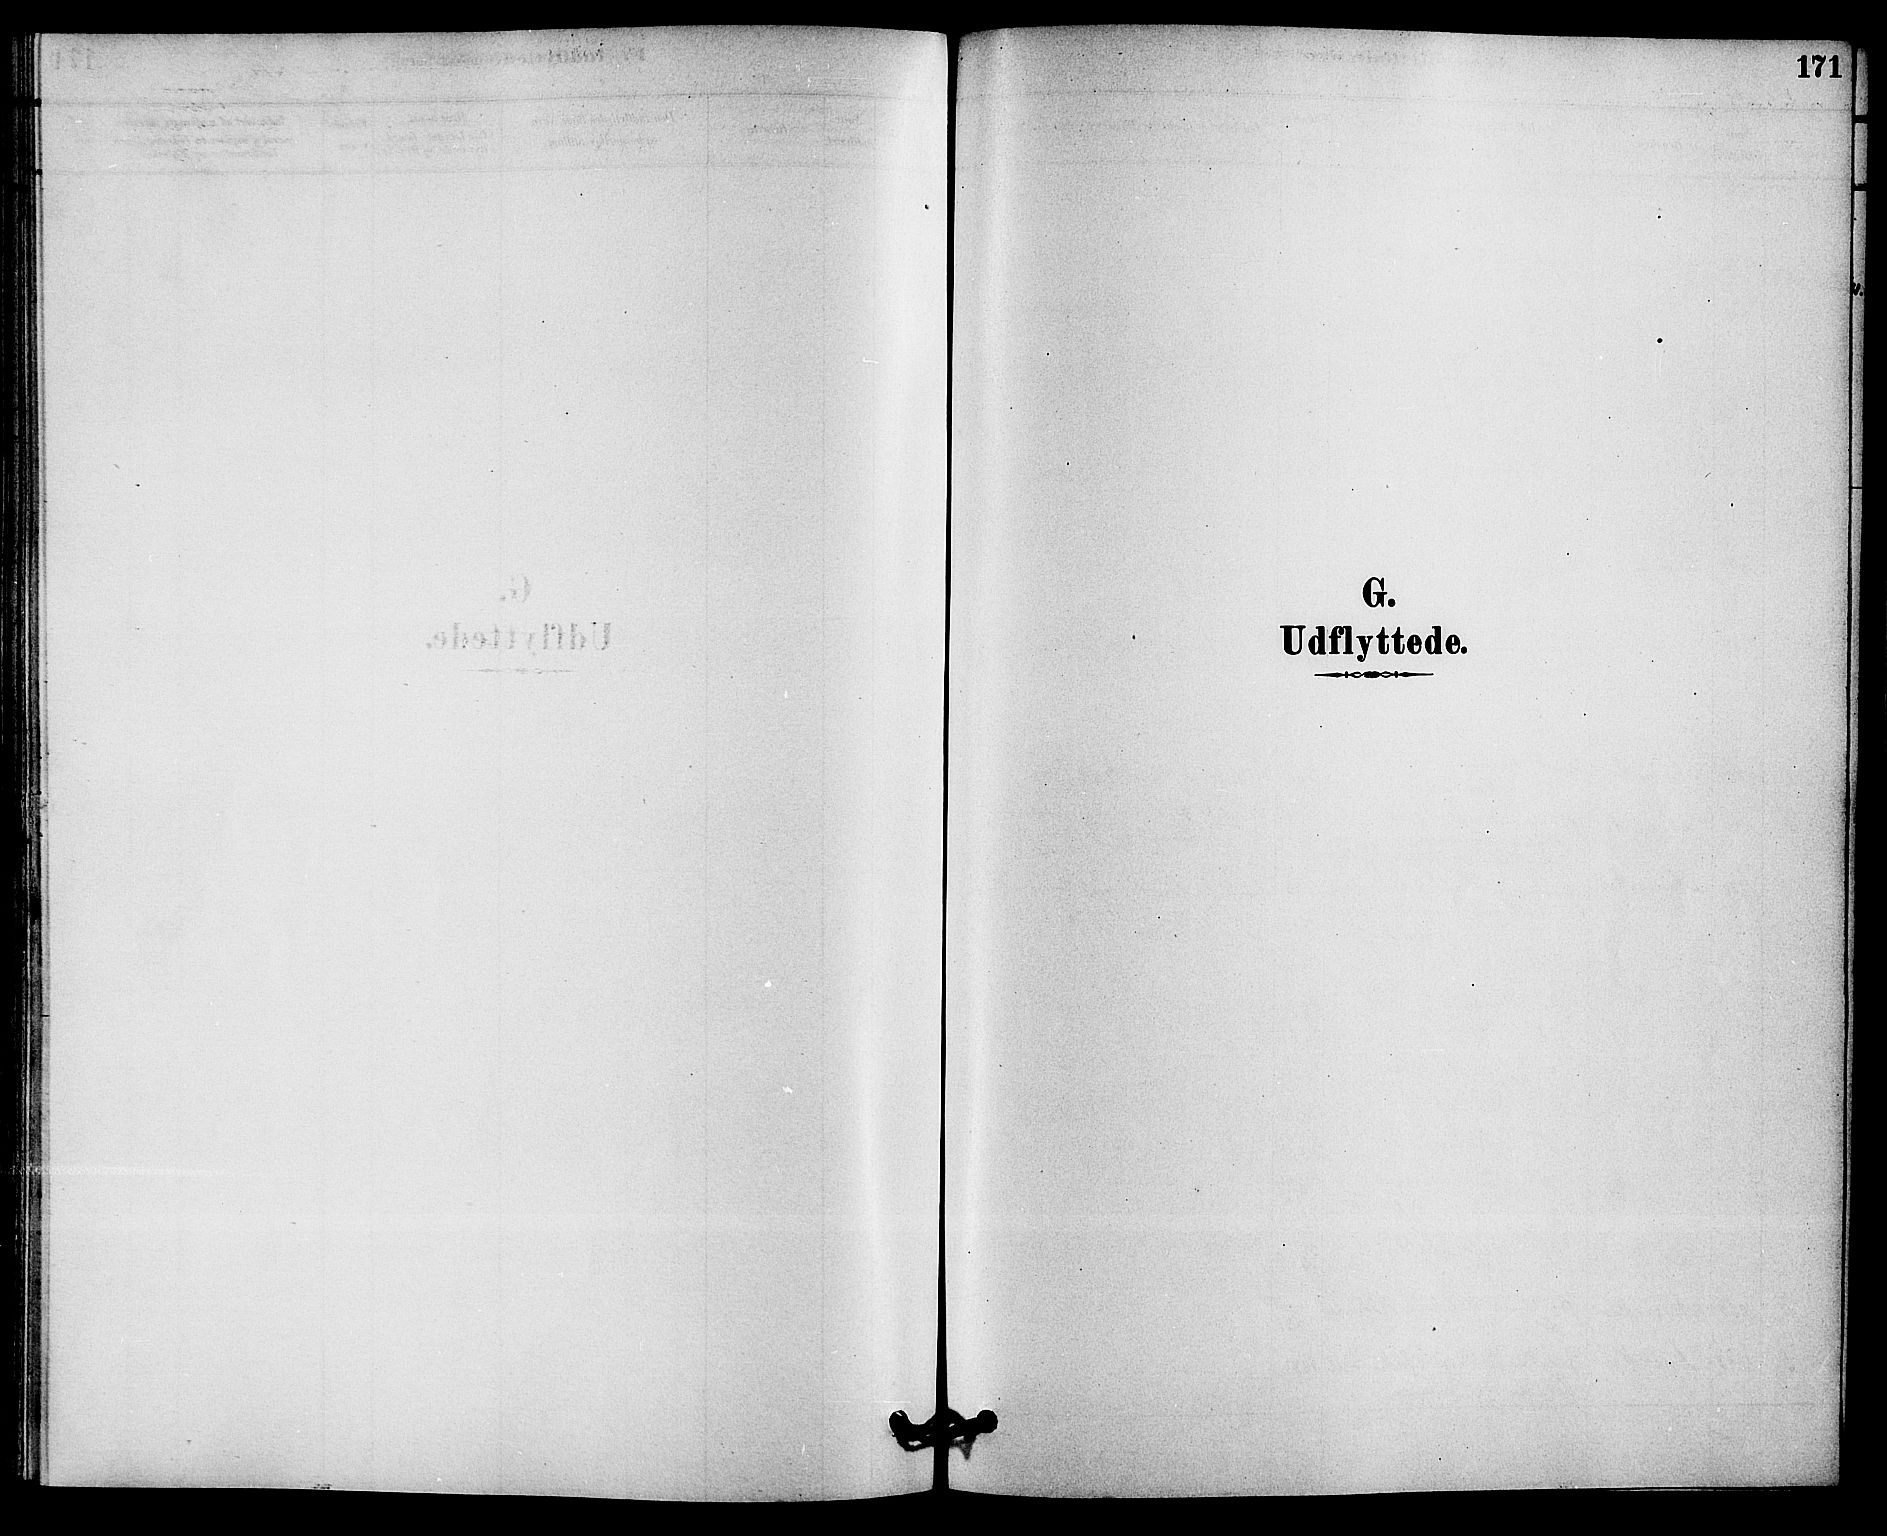 SAKO, Solum kirkebøker, F/Fb/L0001: Ministerialbok nr. II 1, 1877-1892, s. 171